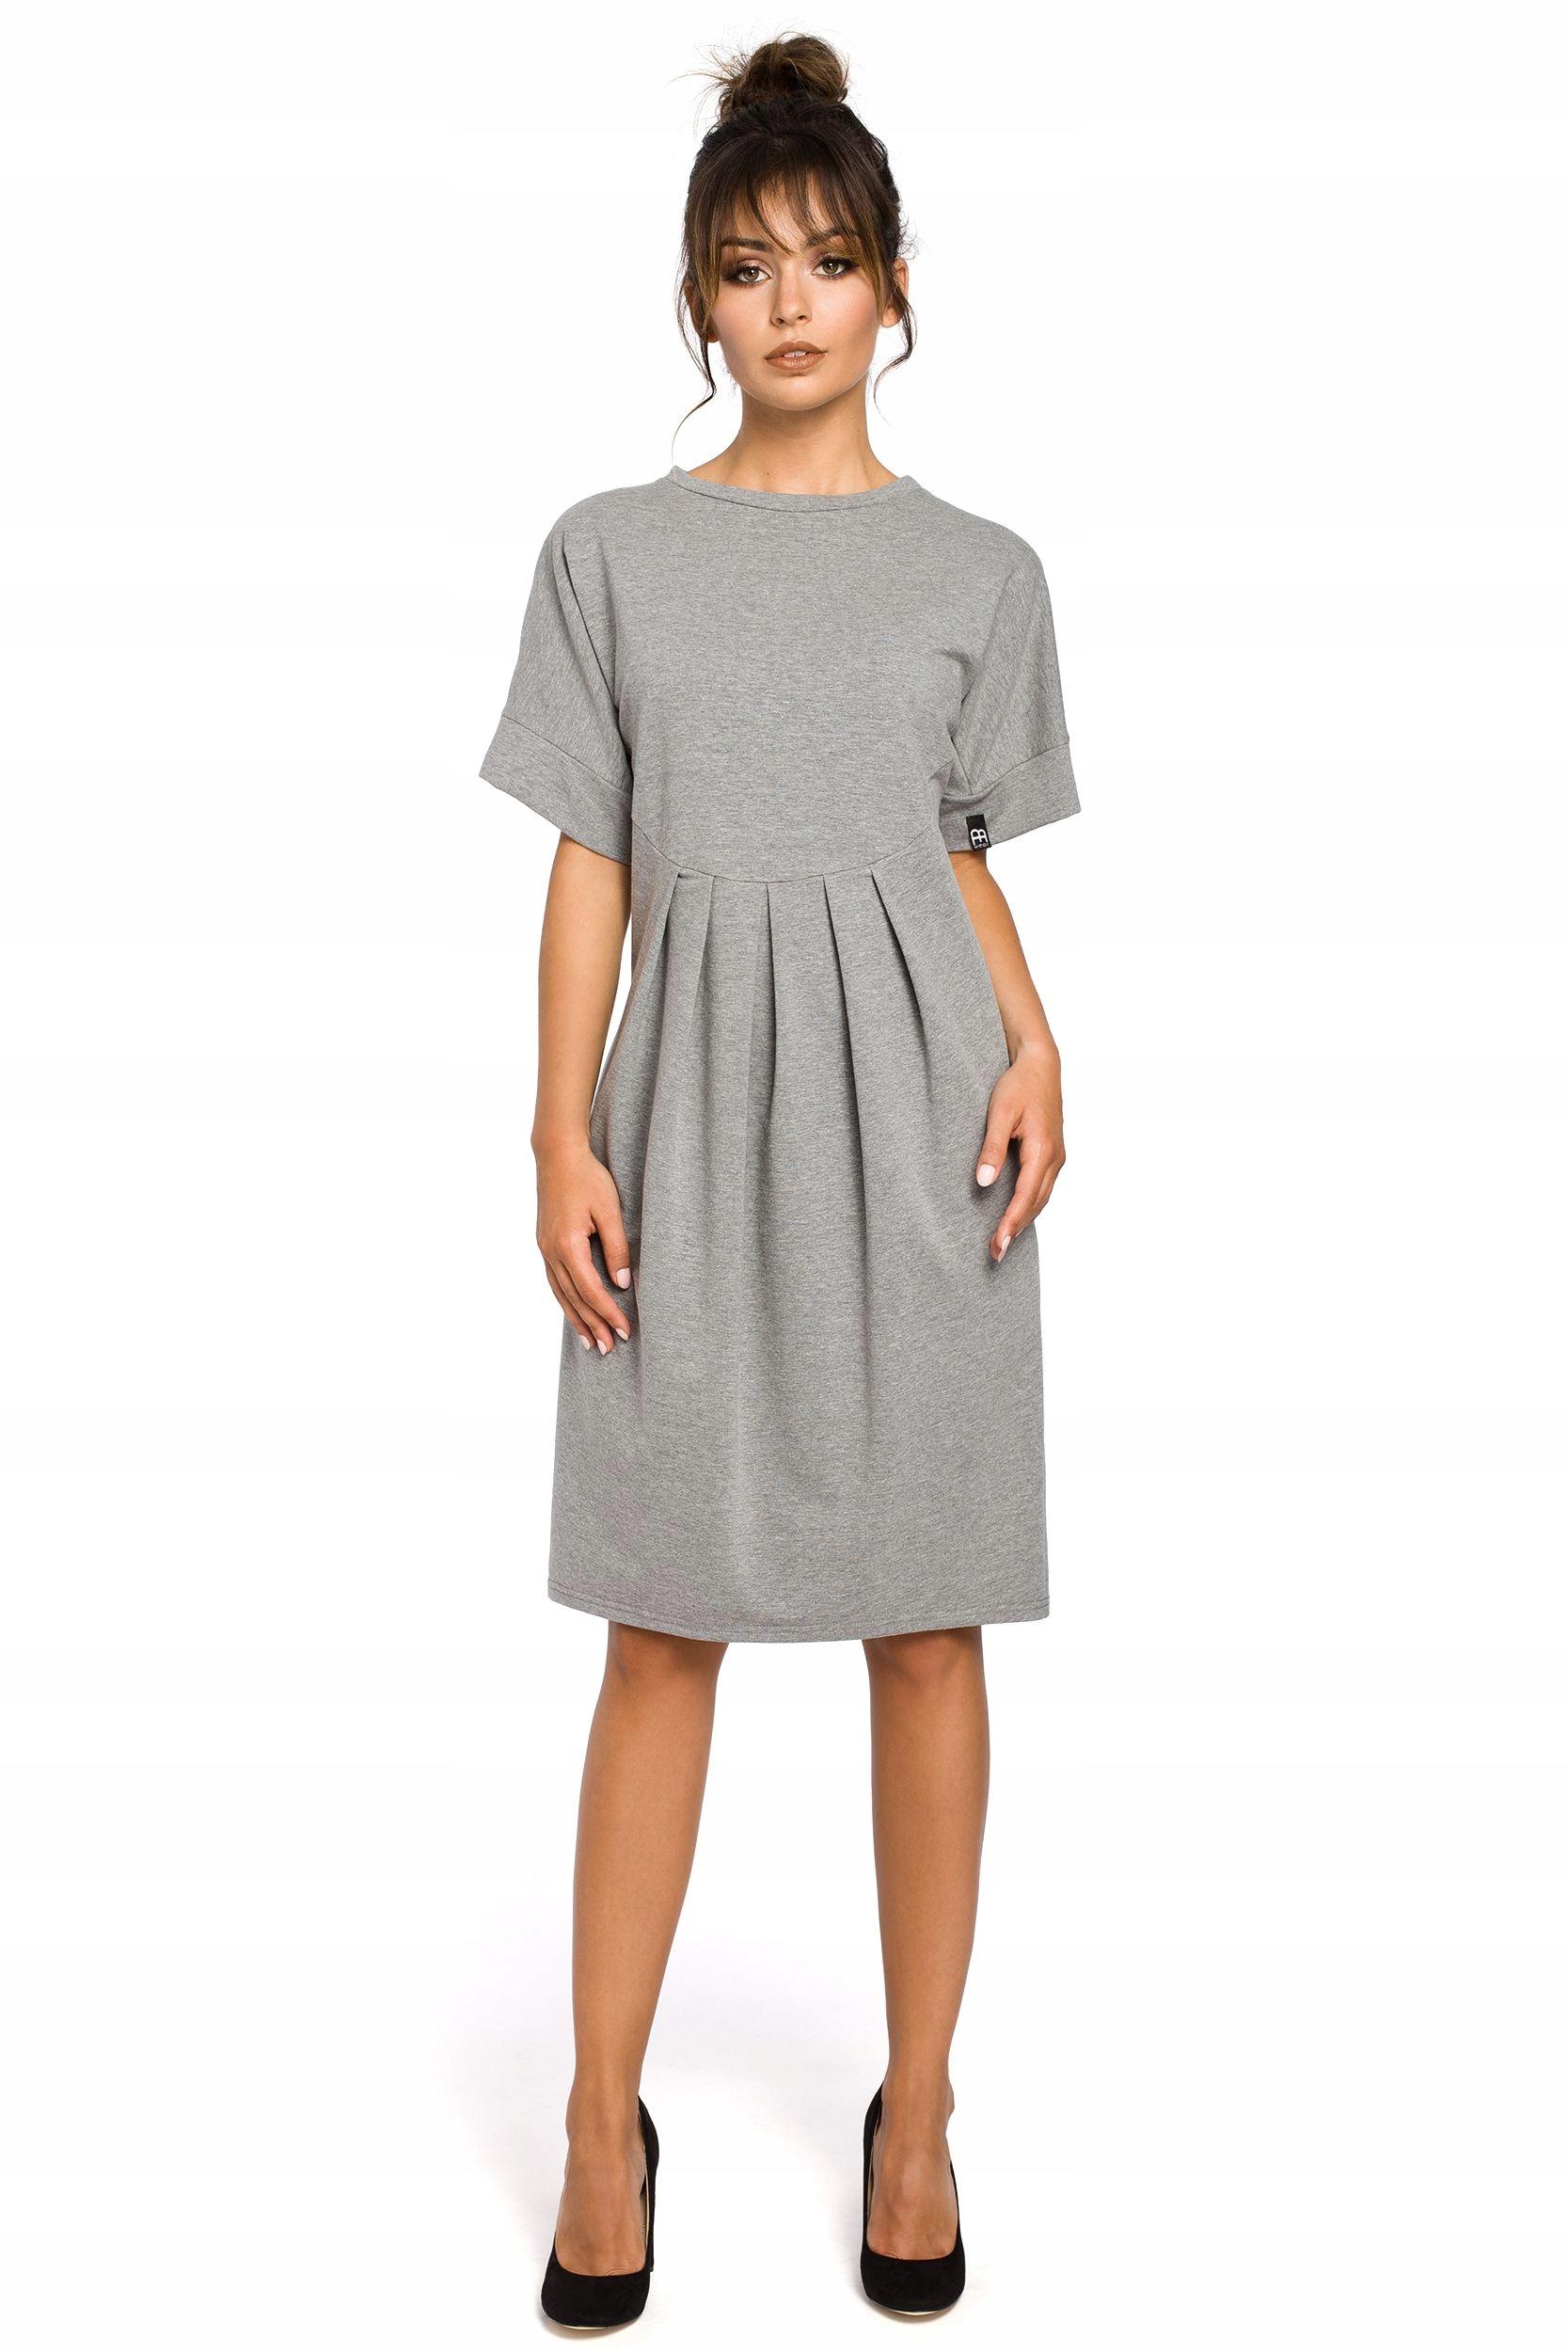 b19842205e B045 Sukienka z zakładkami - szara S M 7607717716 - Allegro.pl